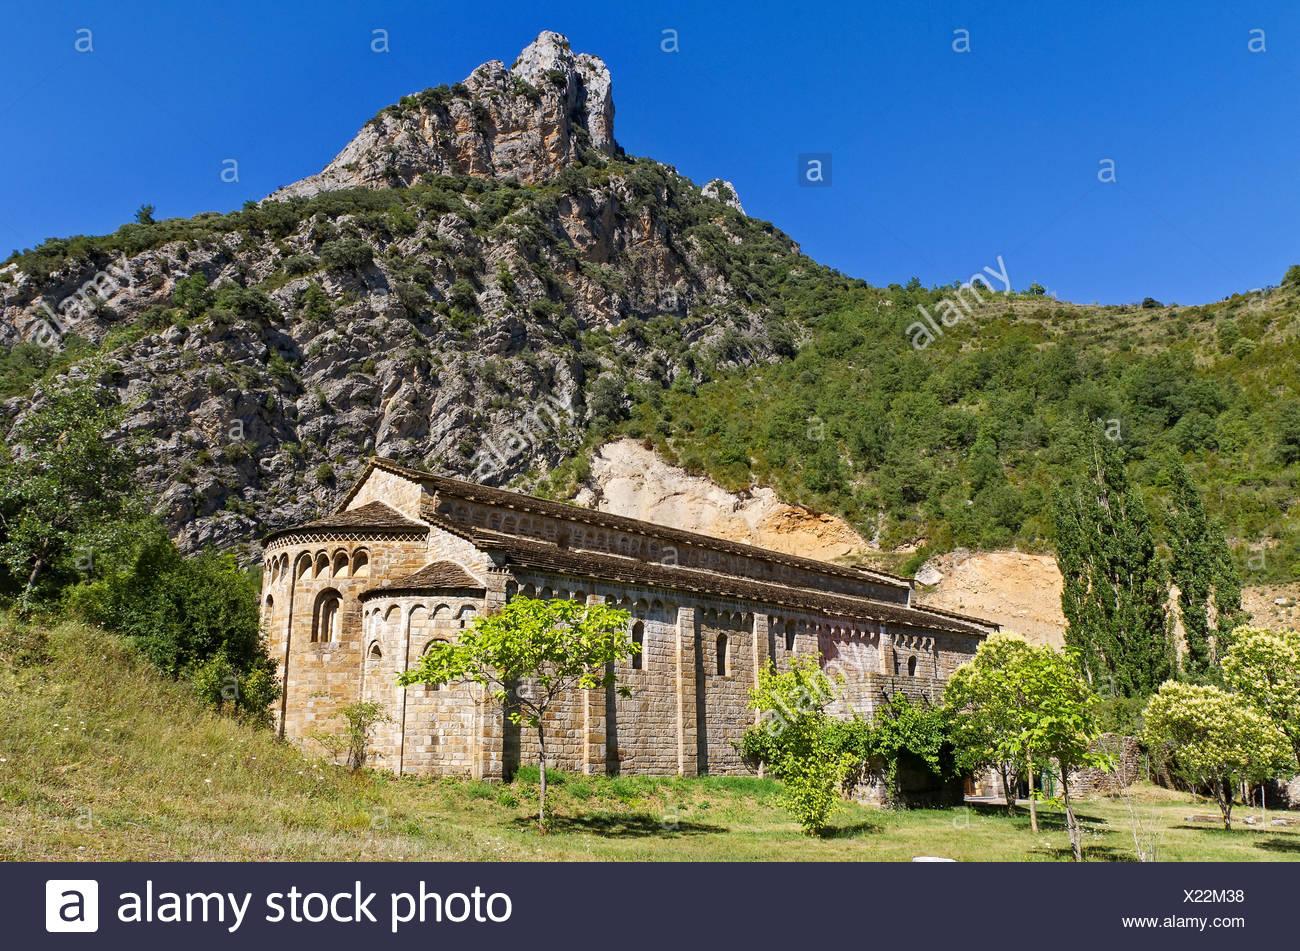 church, temple, spain, tip, peak, valley, mary, arcs, catalan, hermitage, - Stock Image